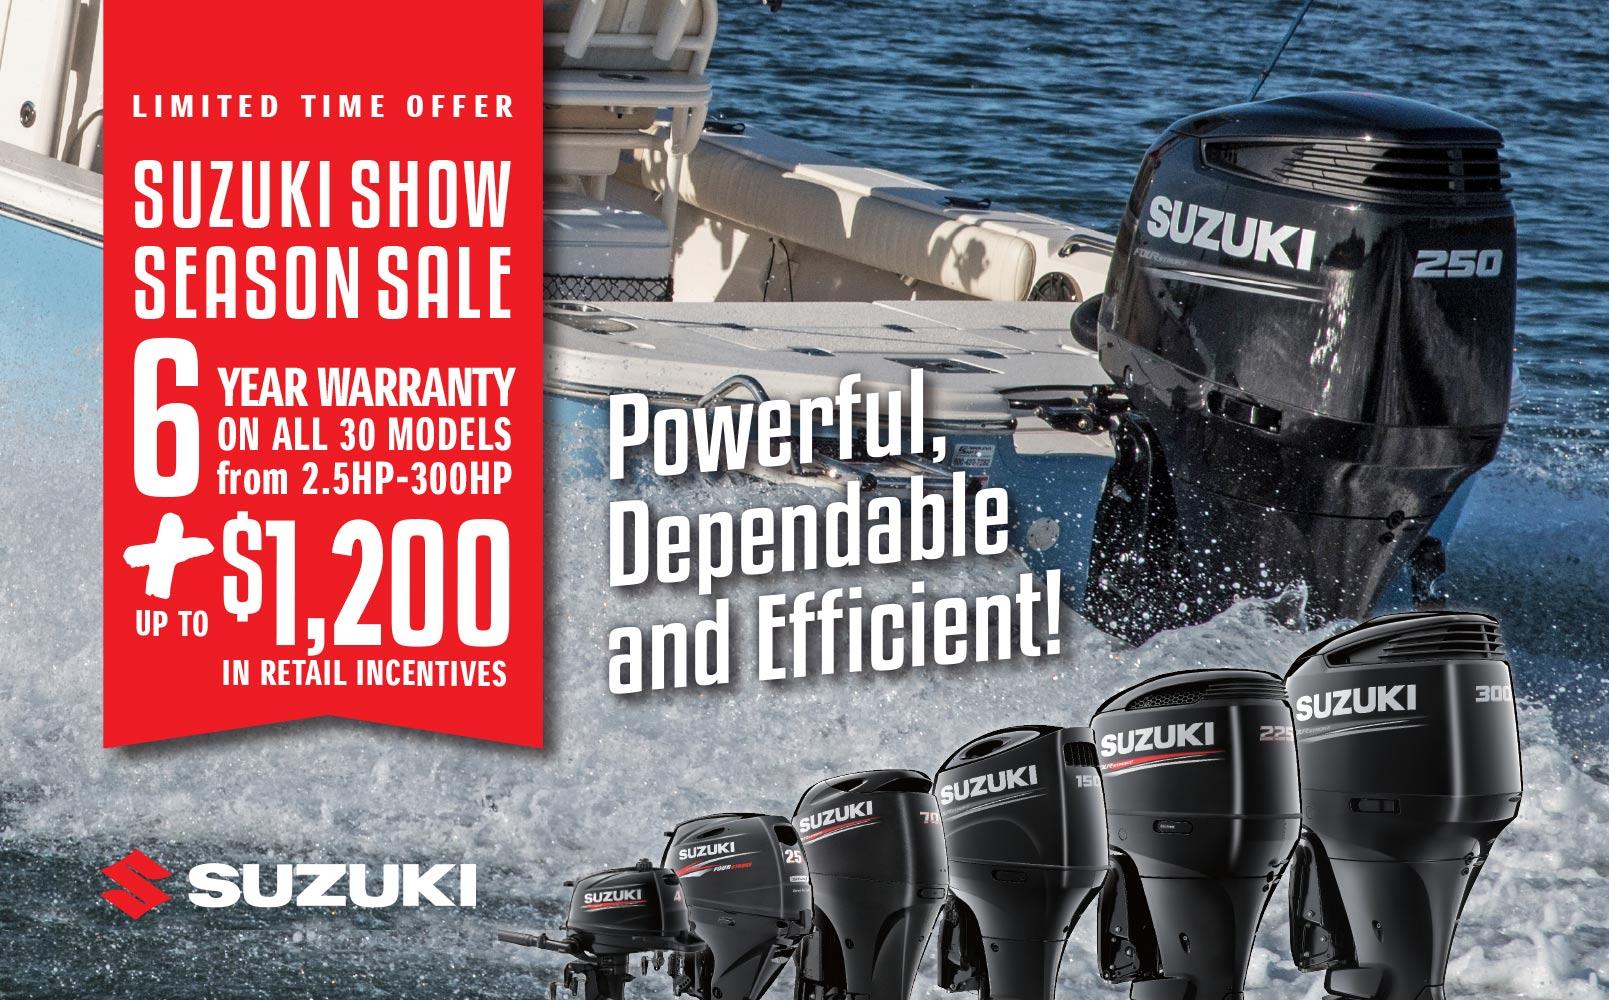 suzuki, suzuki outboard, suzuki motor, evinrude, yamaha, mercury, boat motor